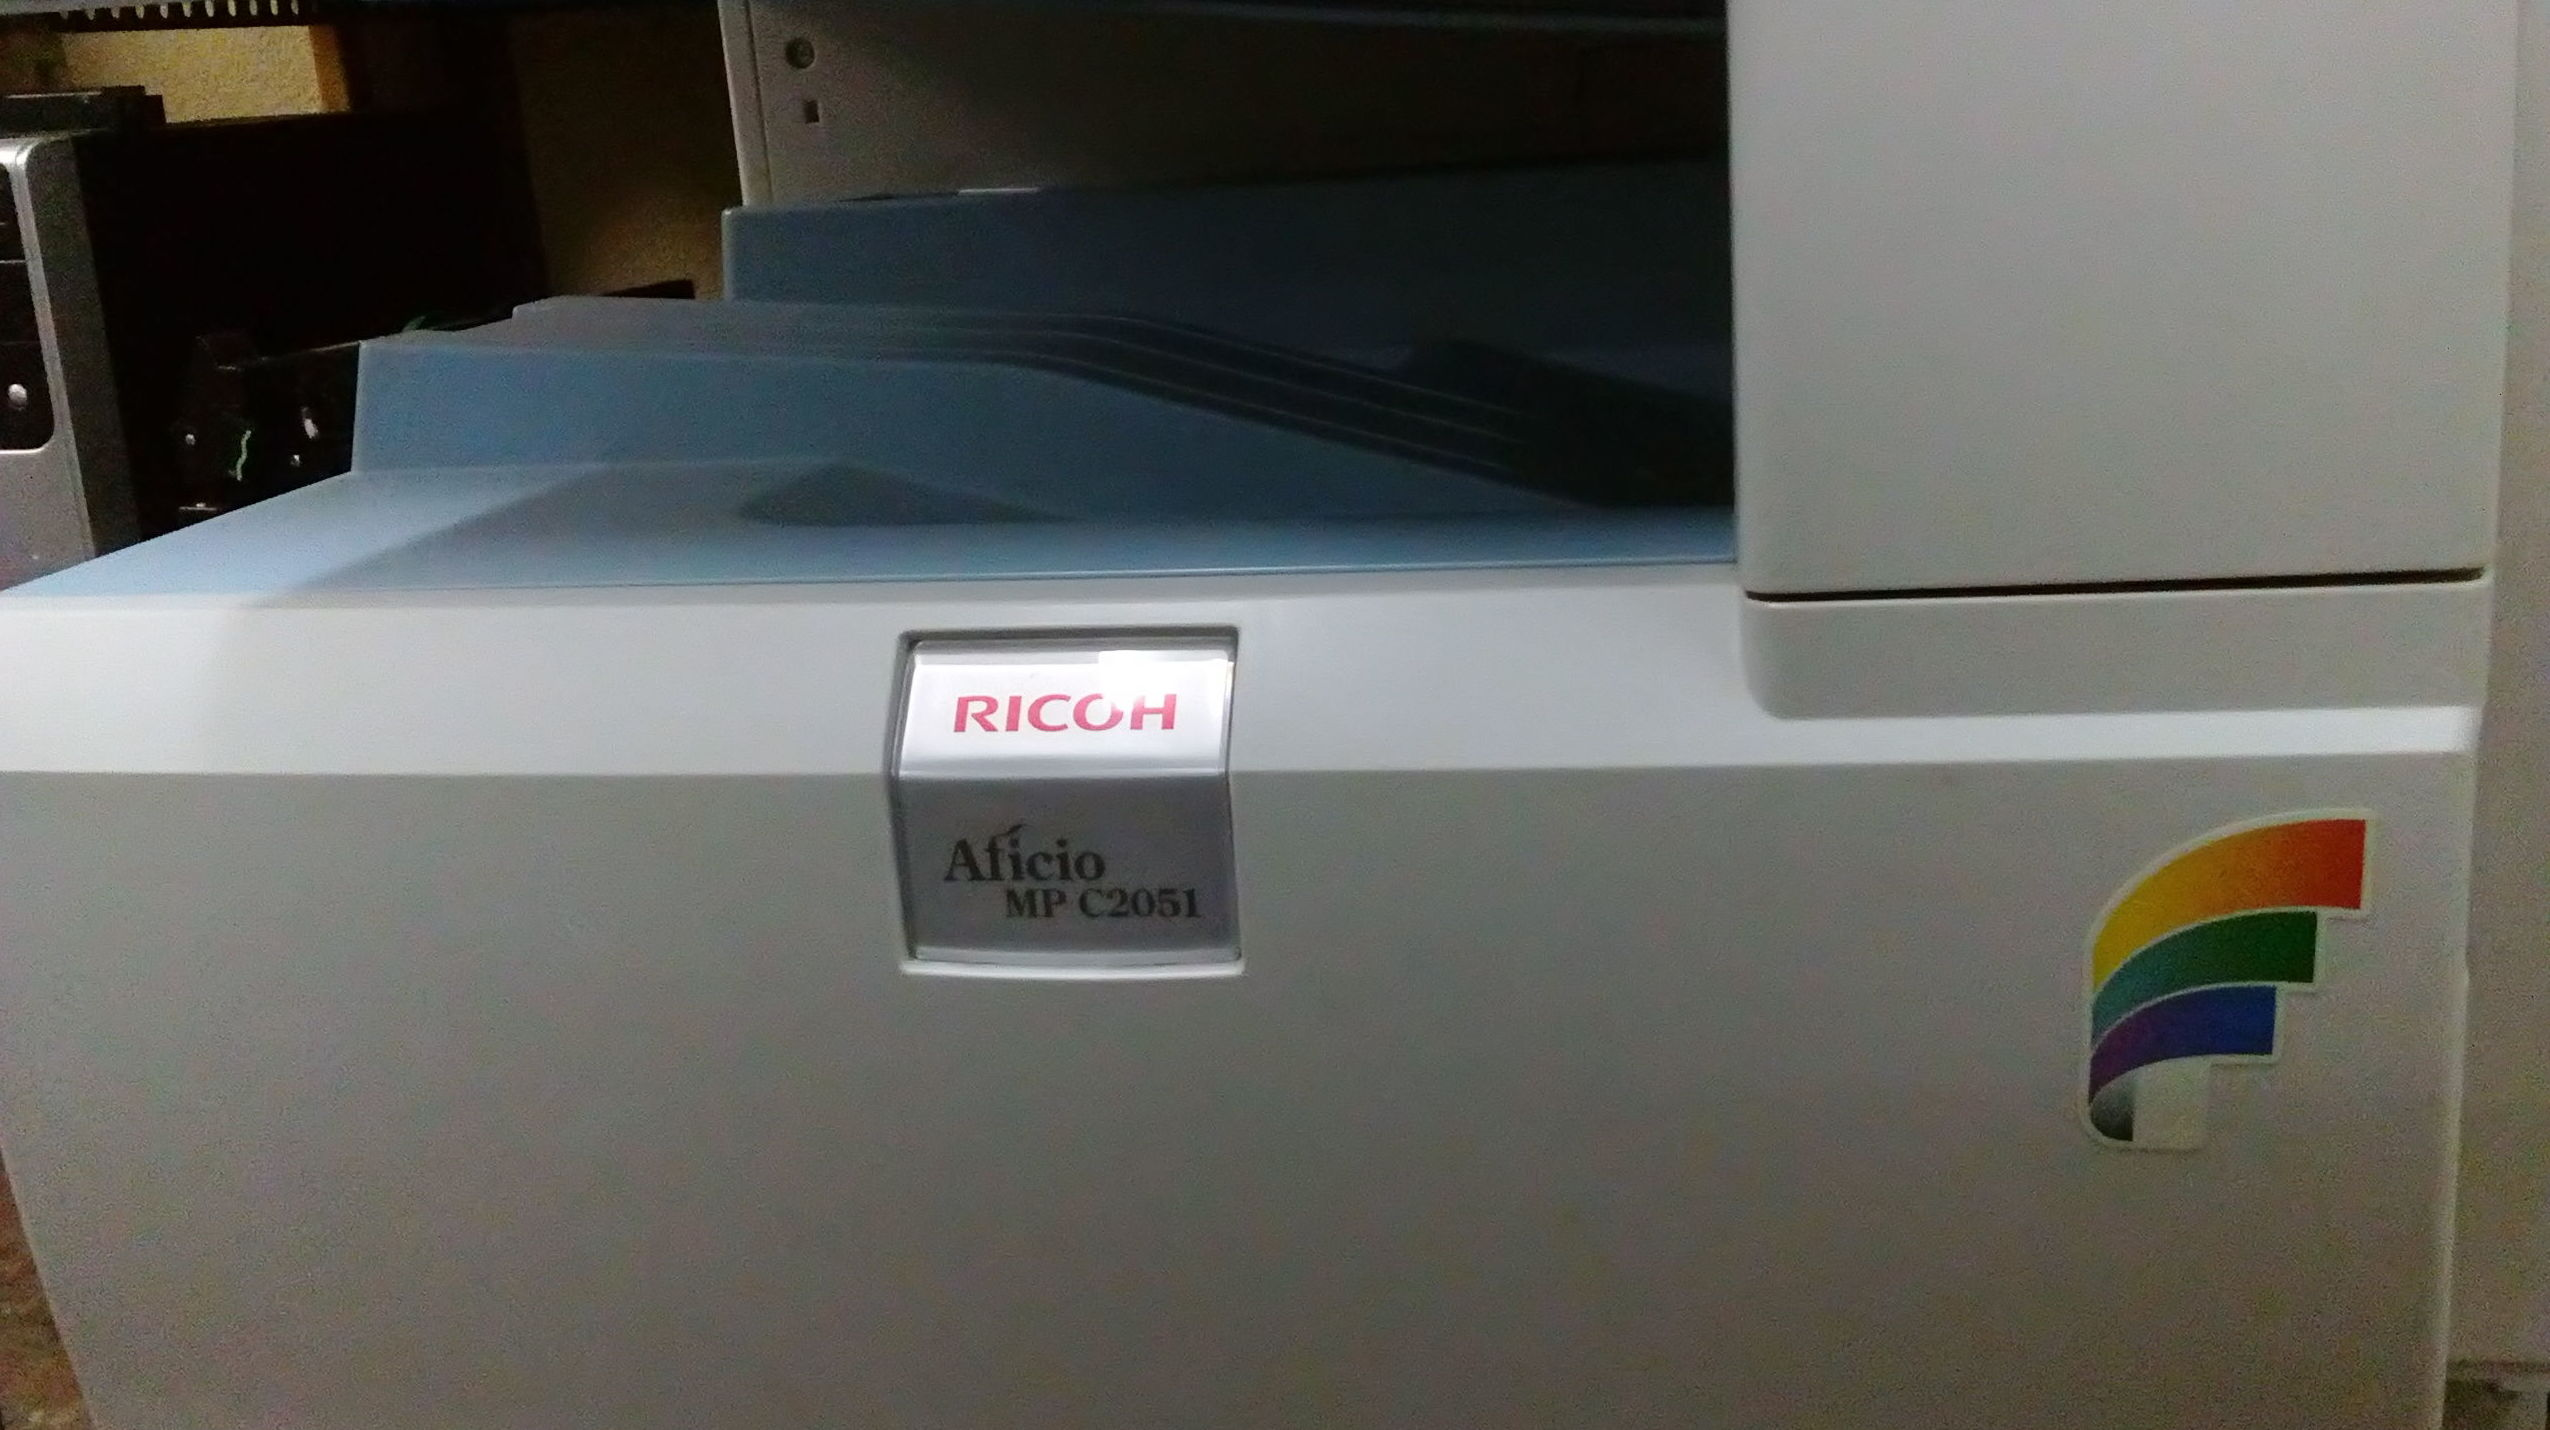 Ricoh Aficio MPC2051